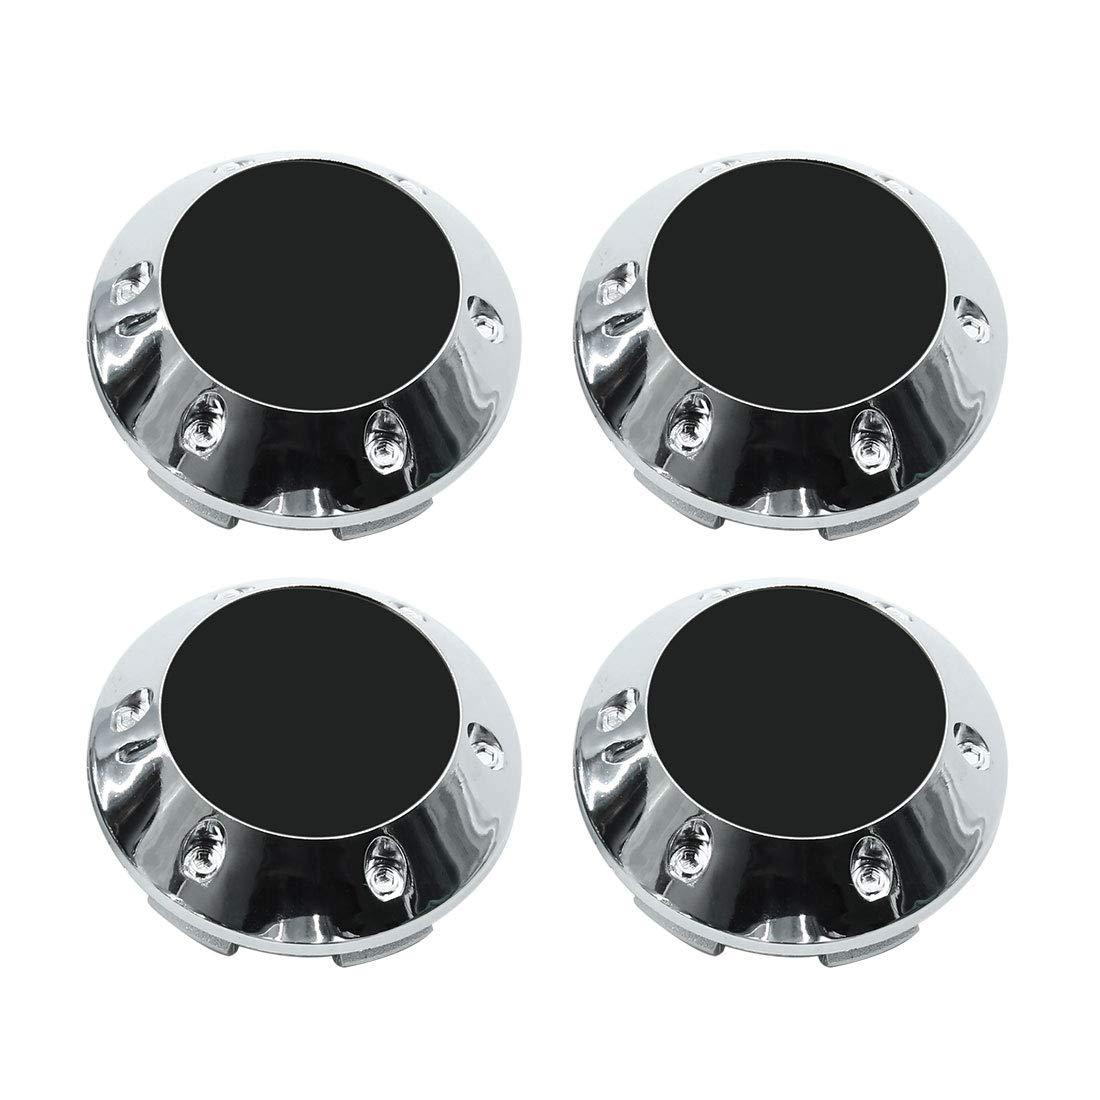 X AUTOHAUX Silver Tone 68mm Car Wheel Tyre Center Hub Caps Cover with Black Sticker 4pcs